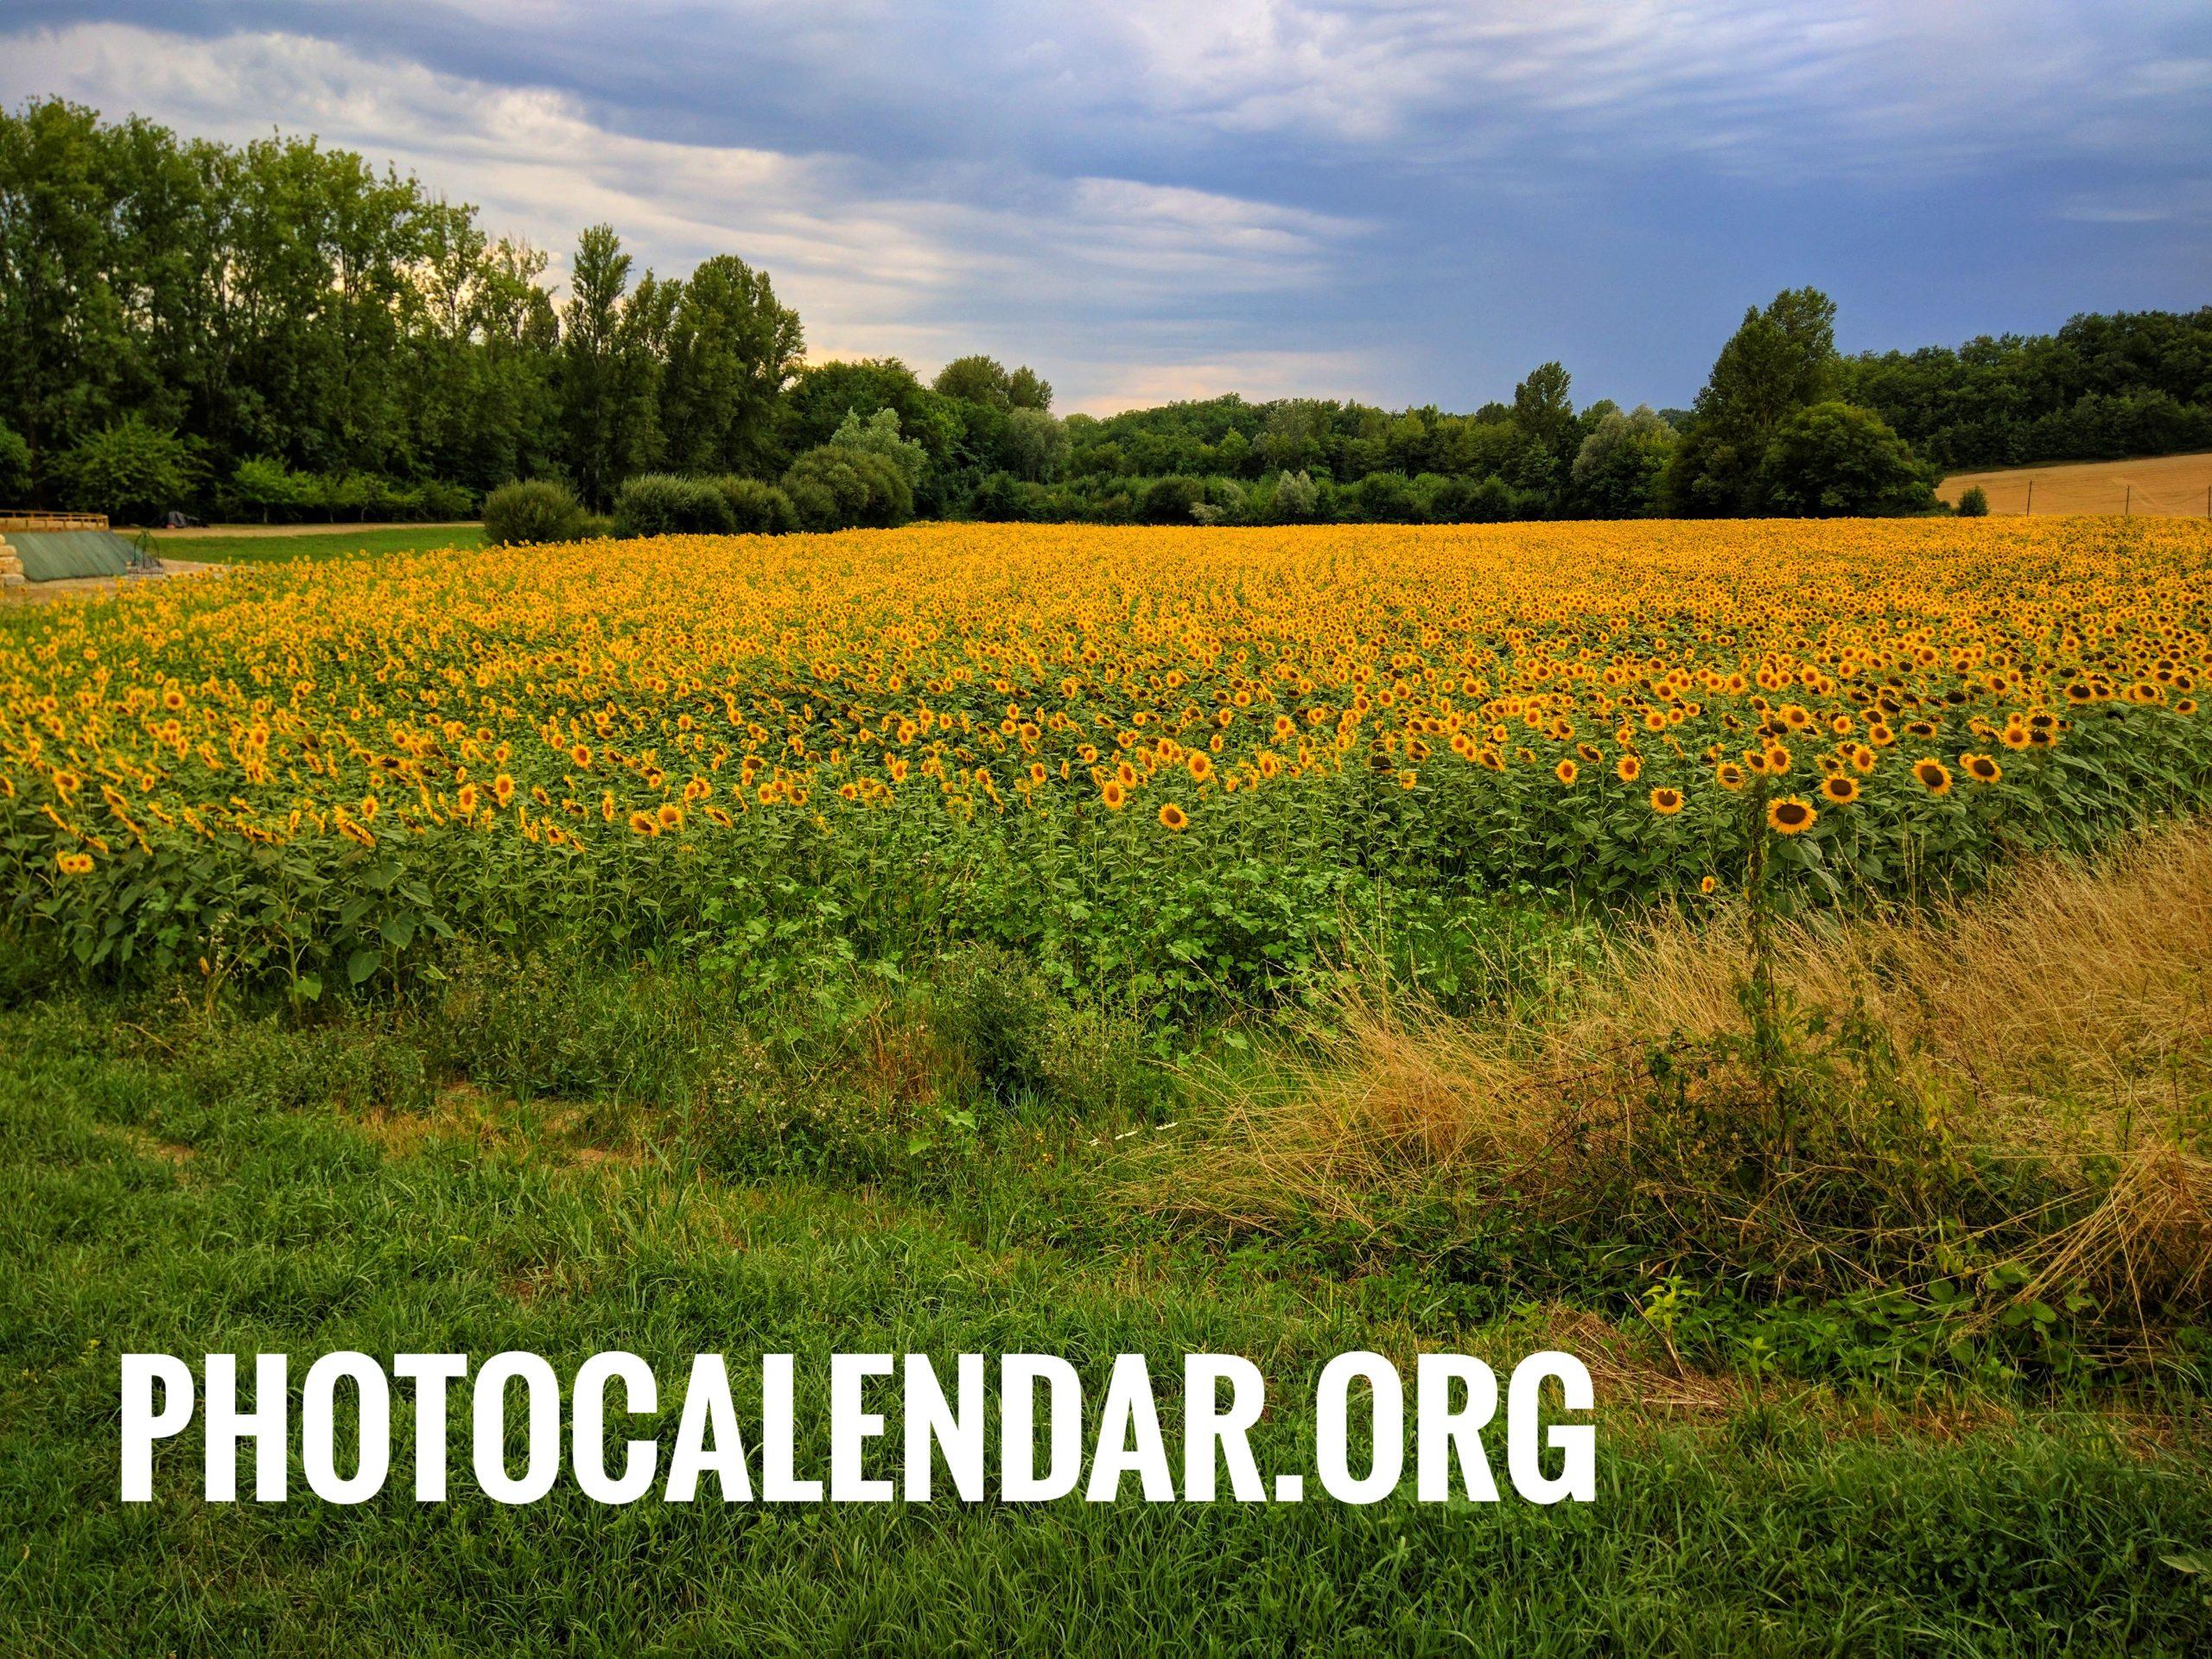 Photo Calendar: PhotoCalendar.org, domain name for sale